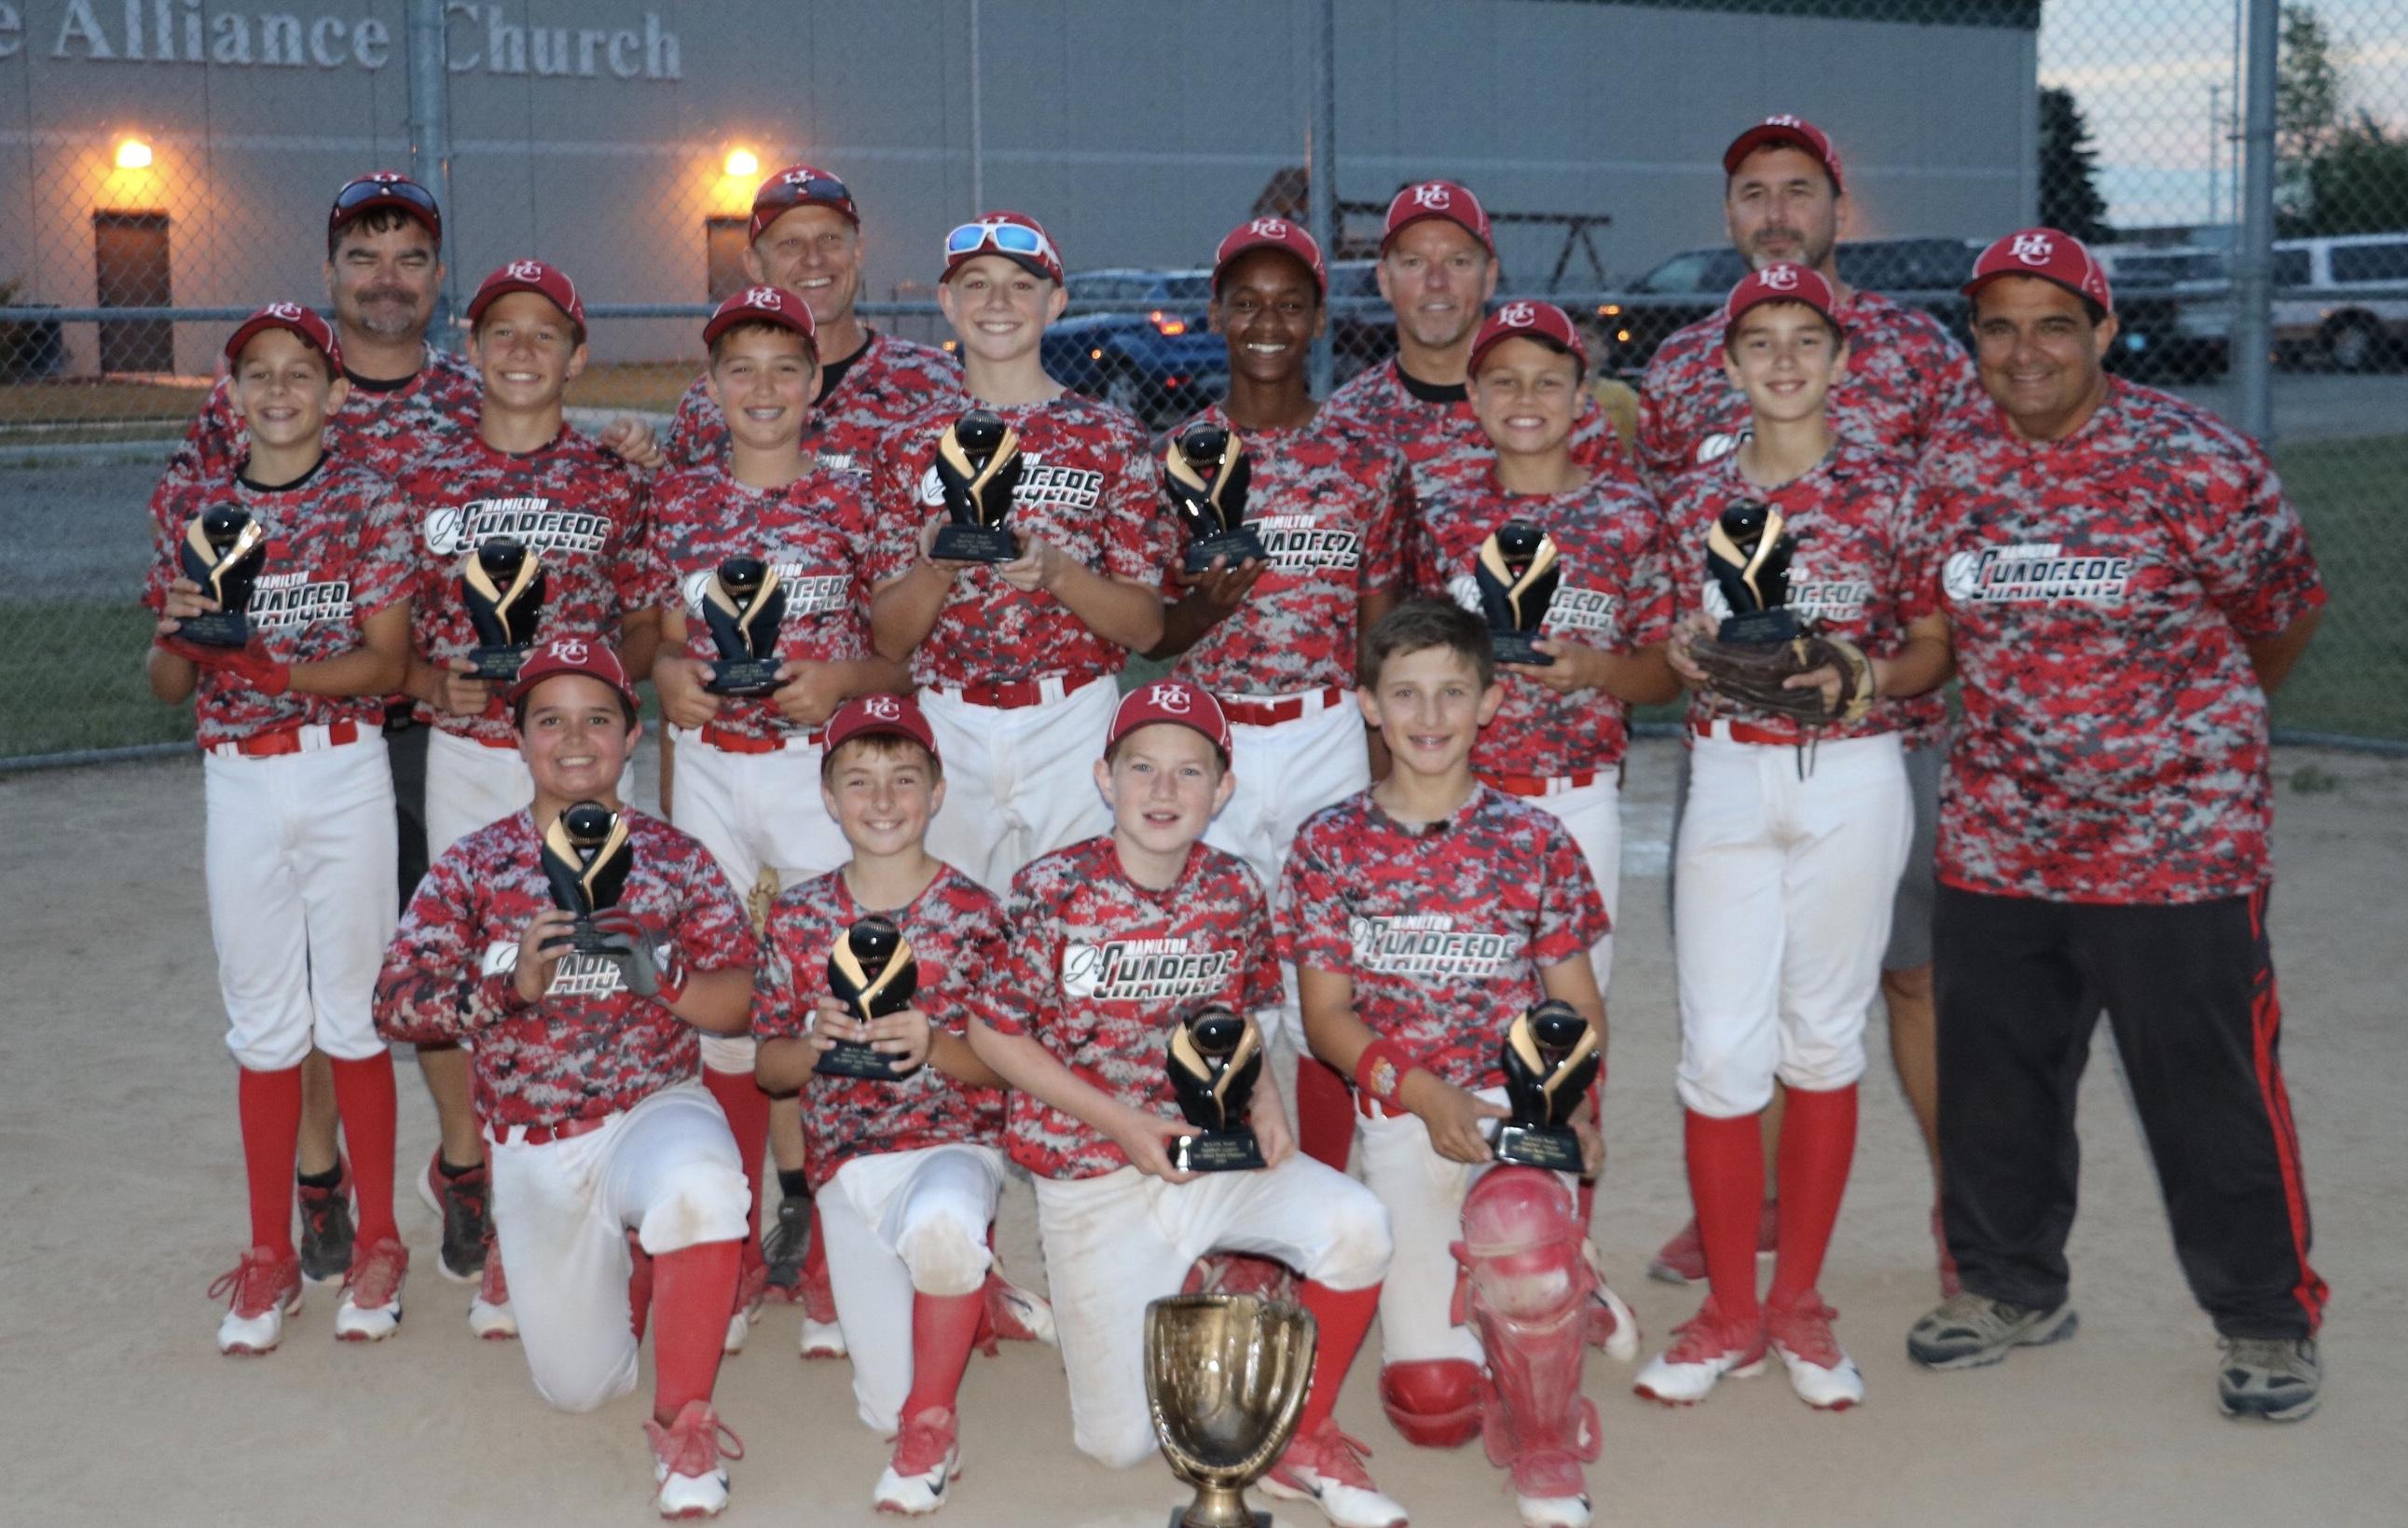 U12 White Champions of MAJOR YBL Select North League